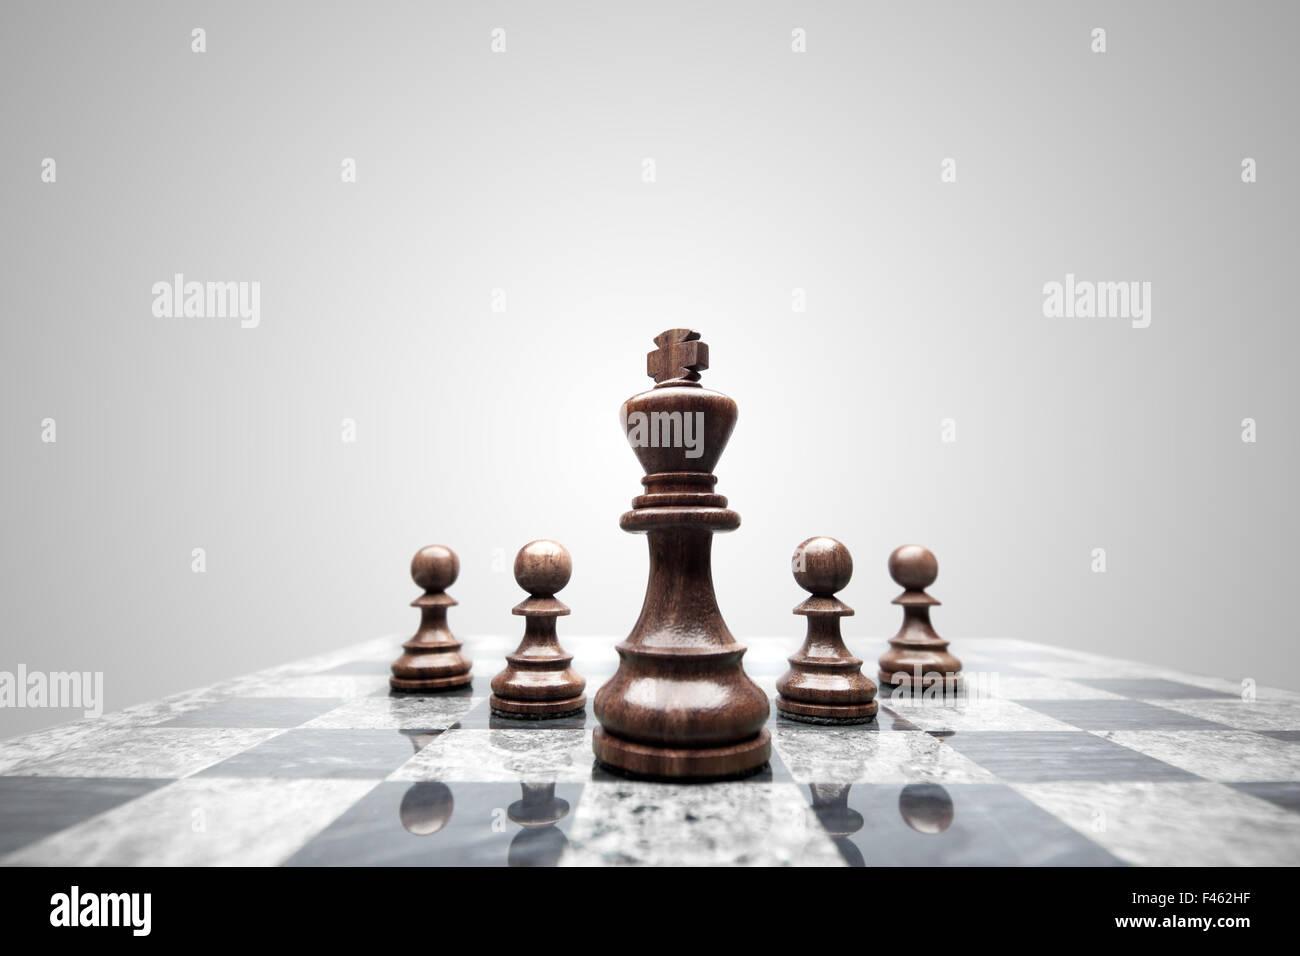 Feel the tactics. - Stock Image